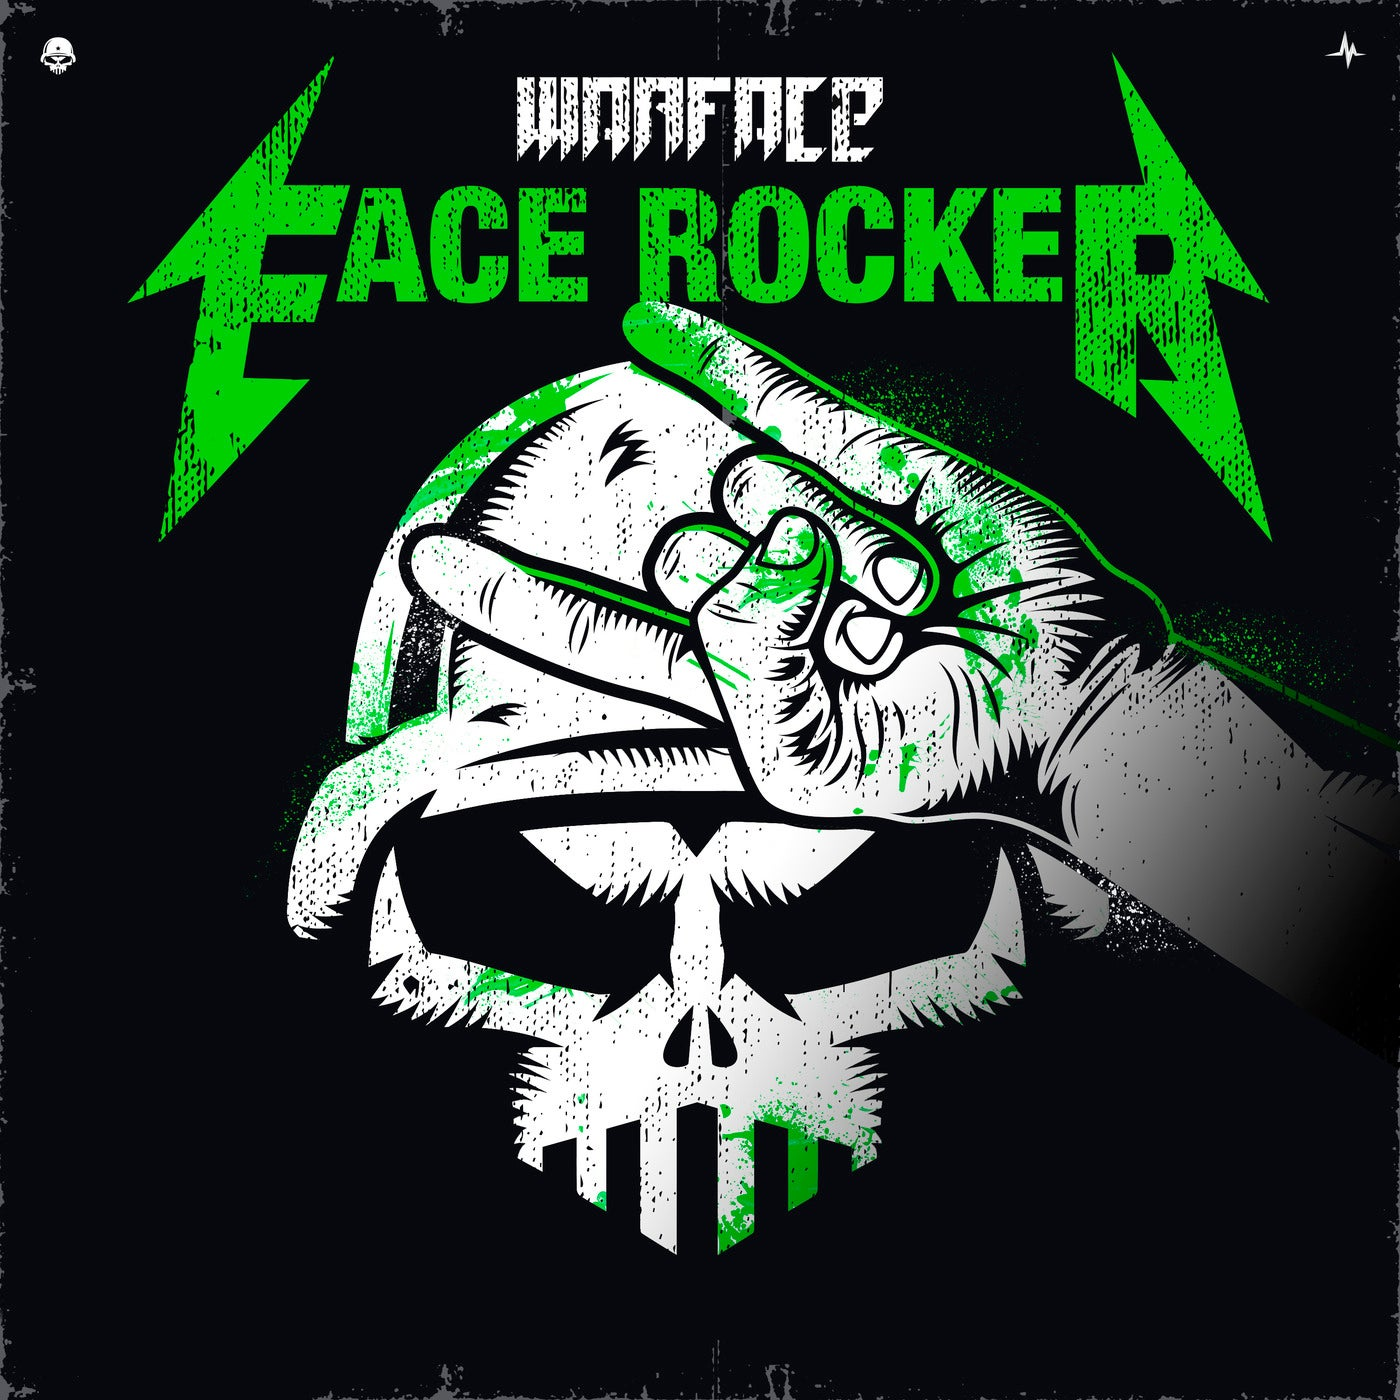 Face Rocker